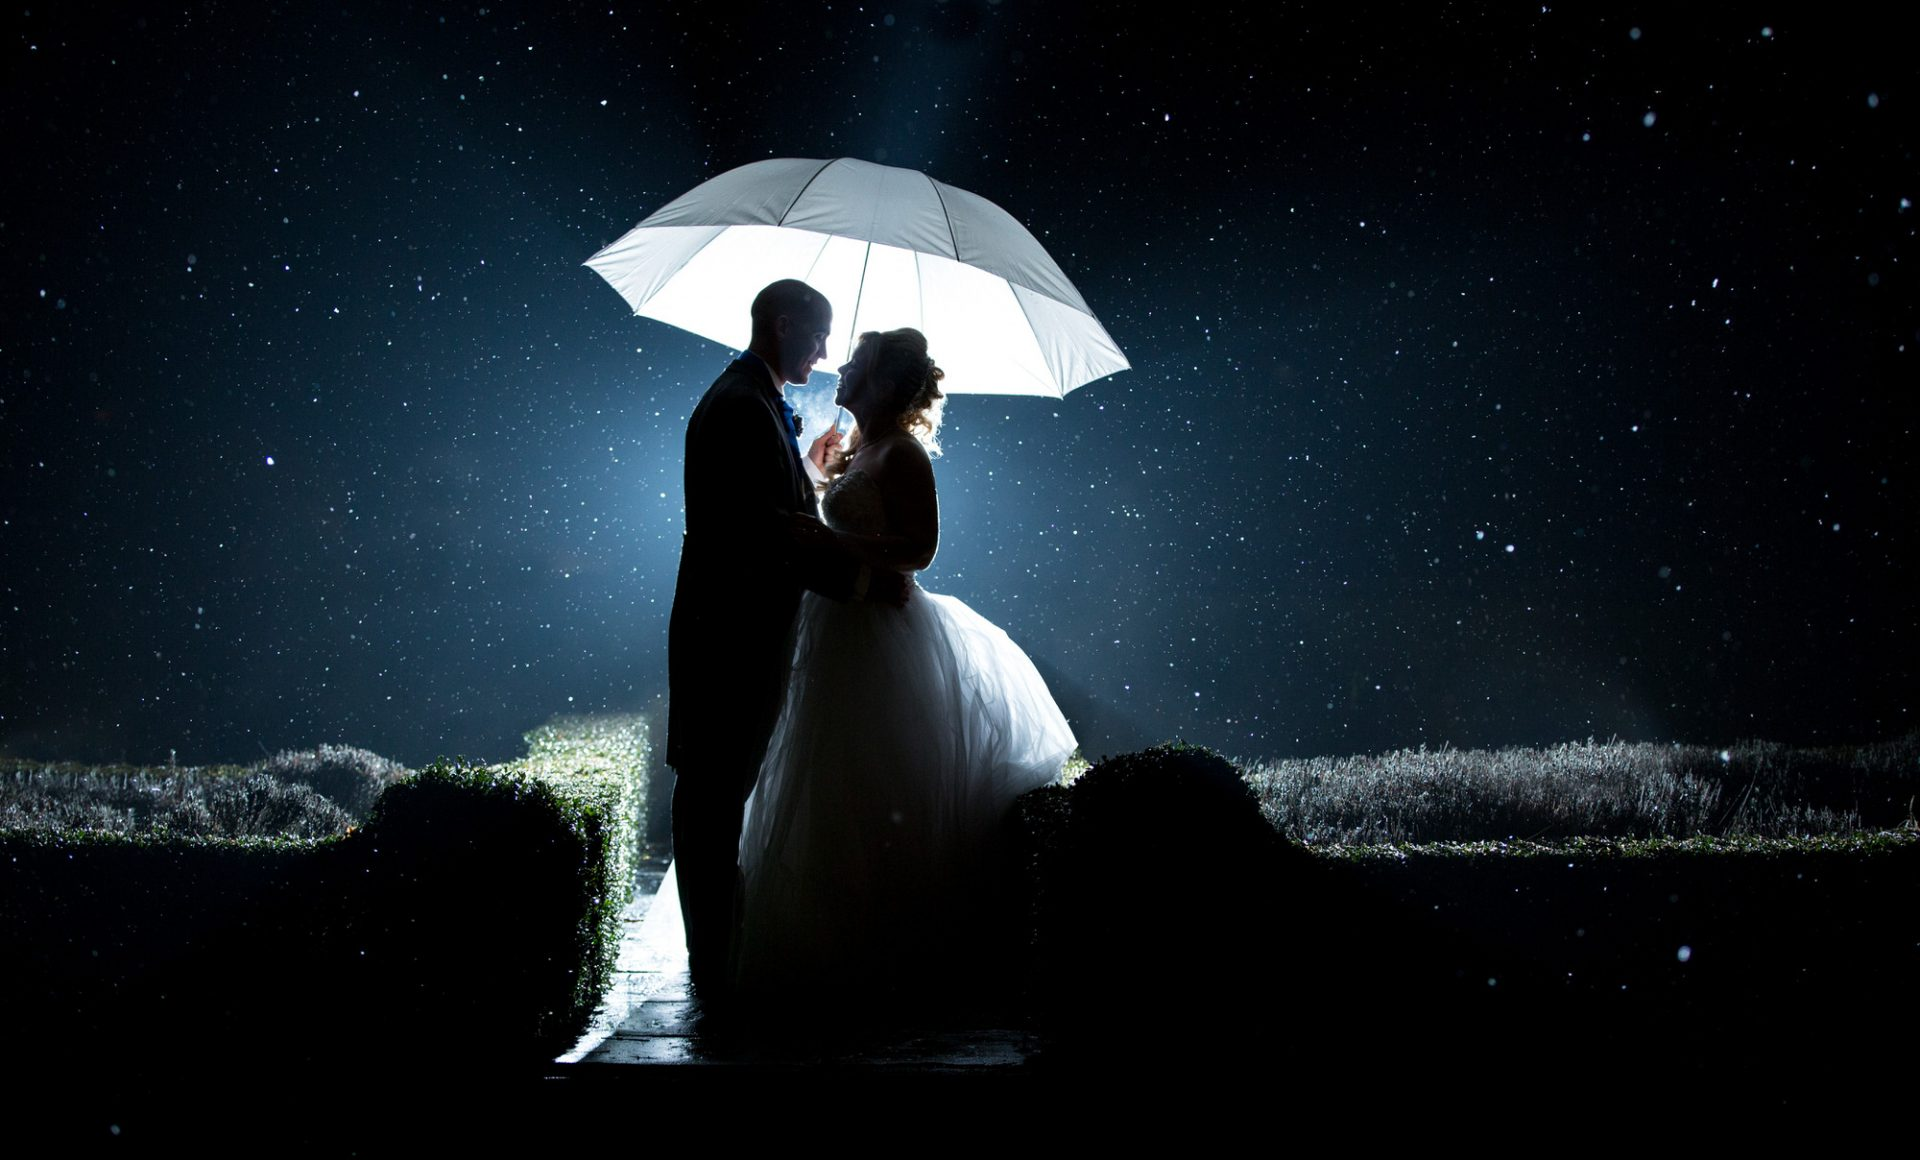 Woodlands-Park-wedding-photography-Chris-woodman-photography-01